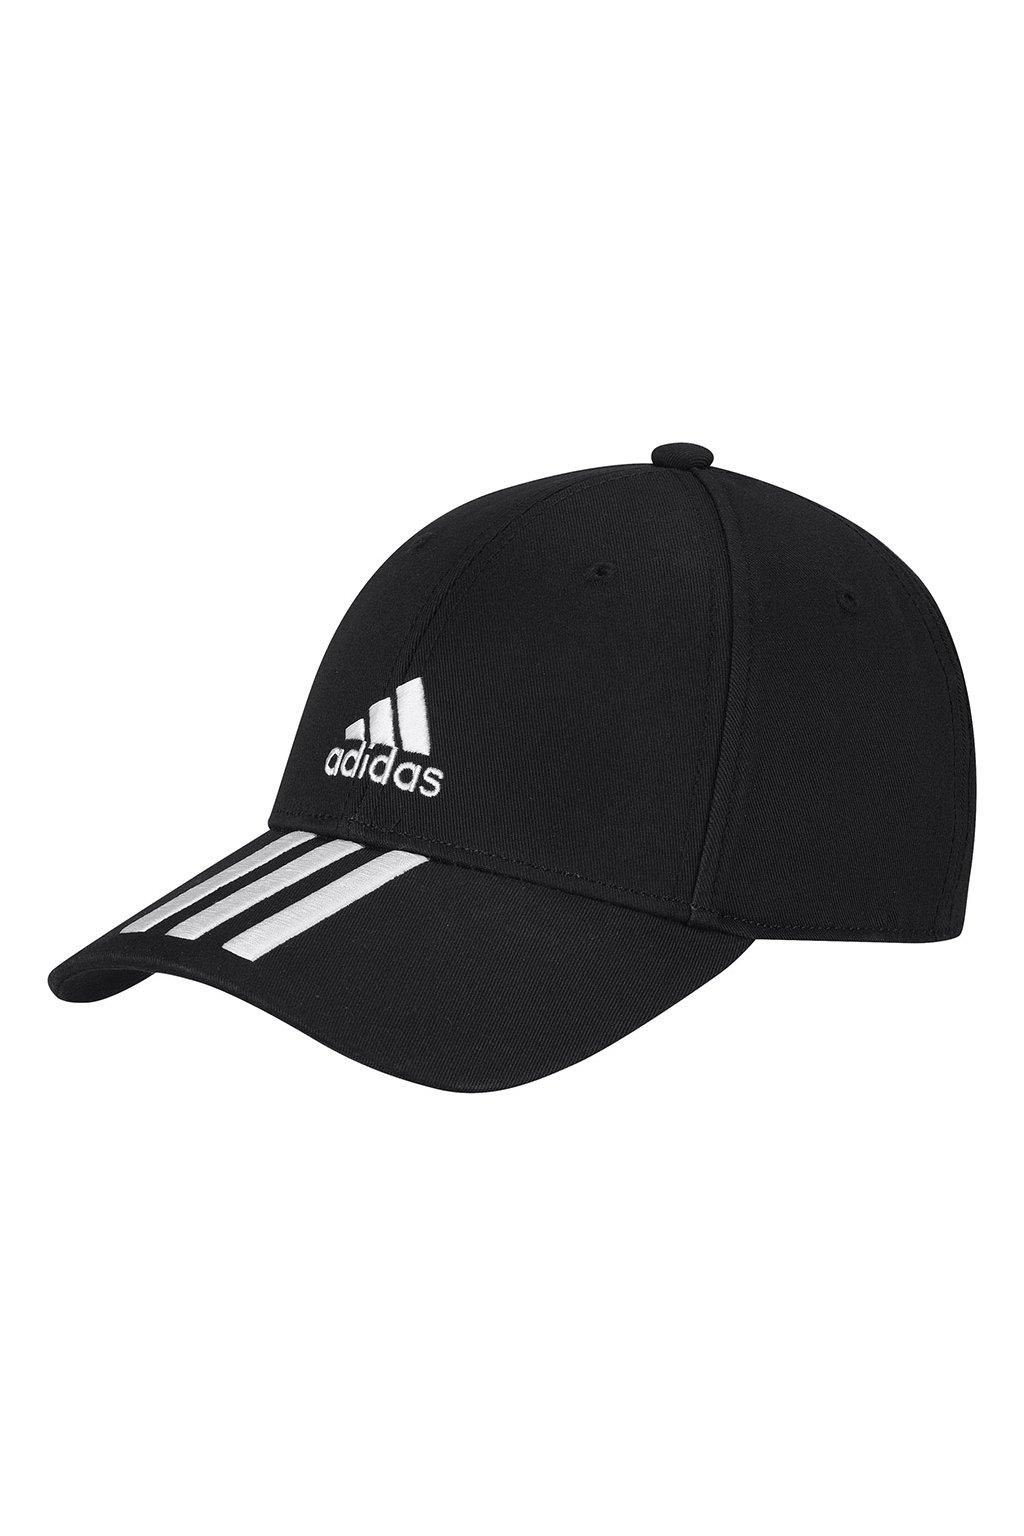 Pánska šiltovka Adidas Baseball Cap Cotton OSFM čierna FK0894